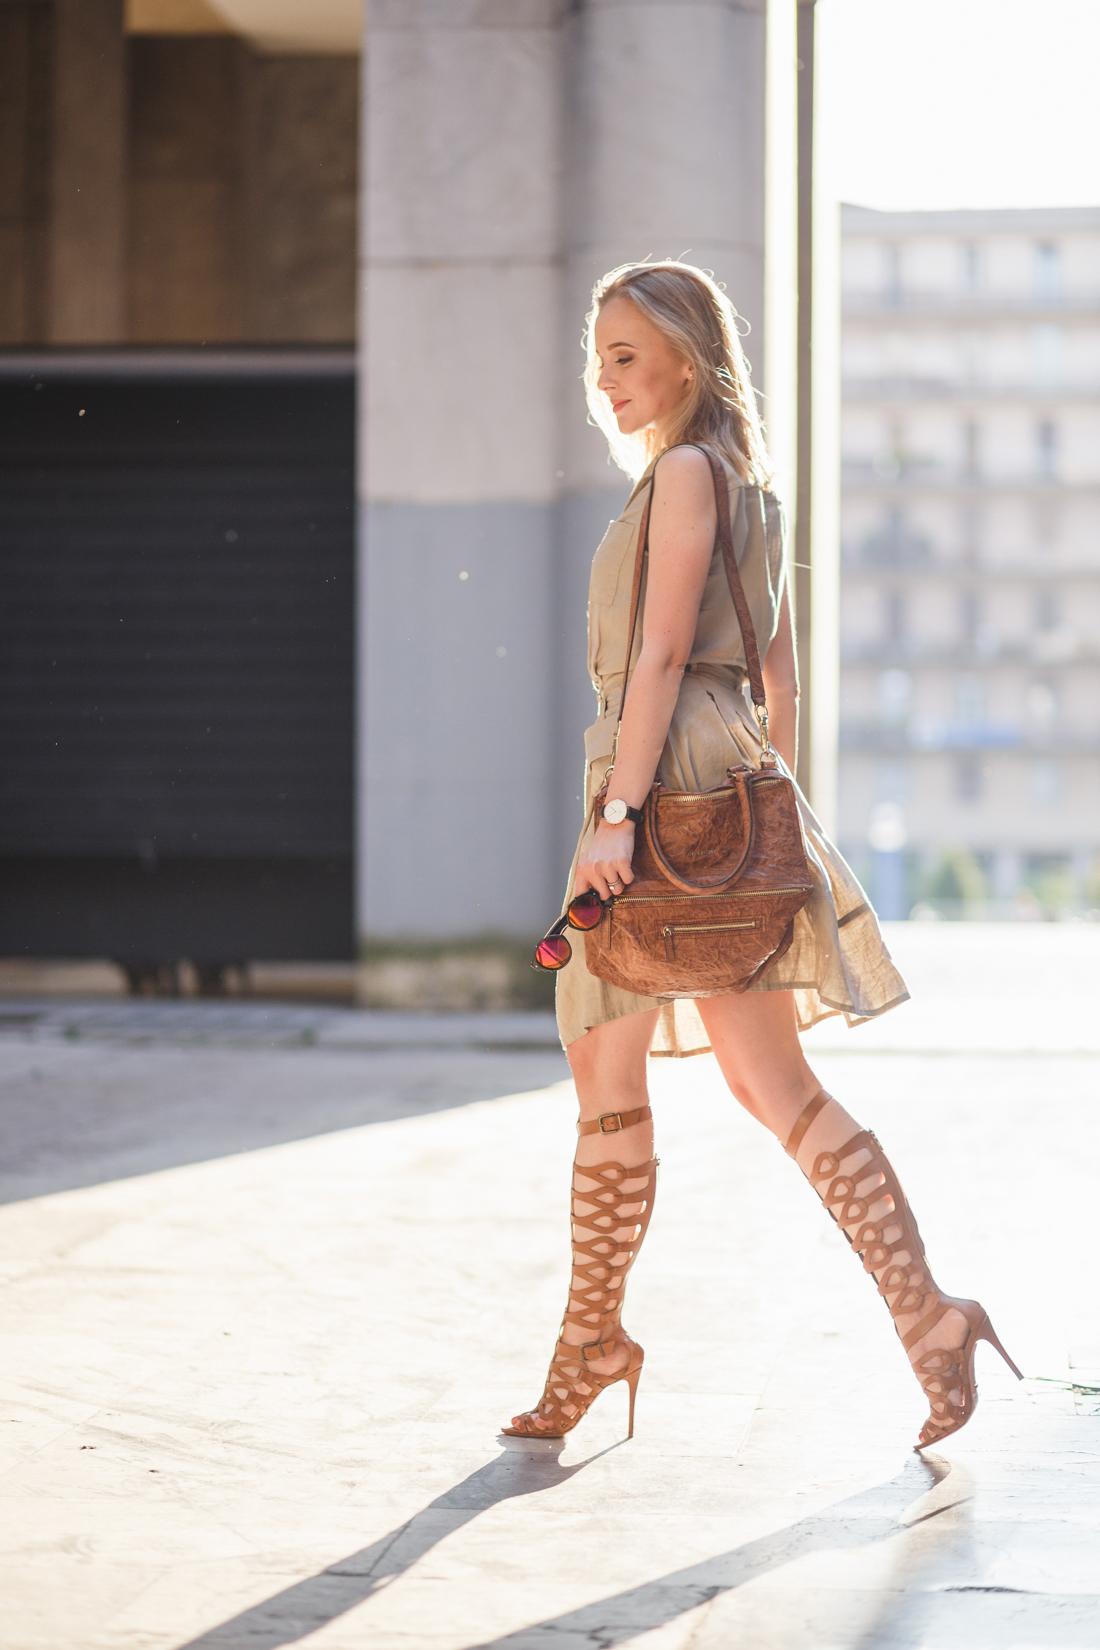 darya kamalova thecablook fashion lifestyle russian italian blogger wears stefanel dress schutz gladiators and giverchy pandora bag-22